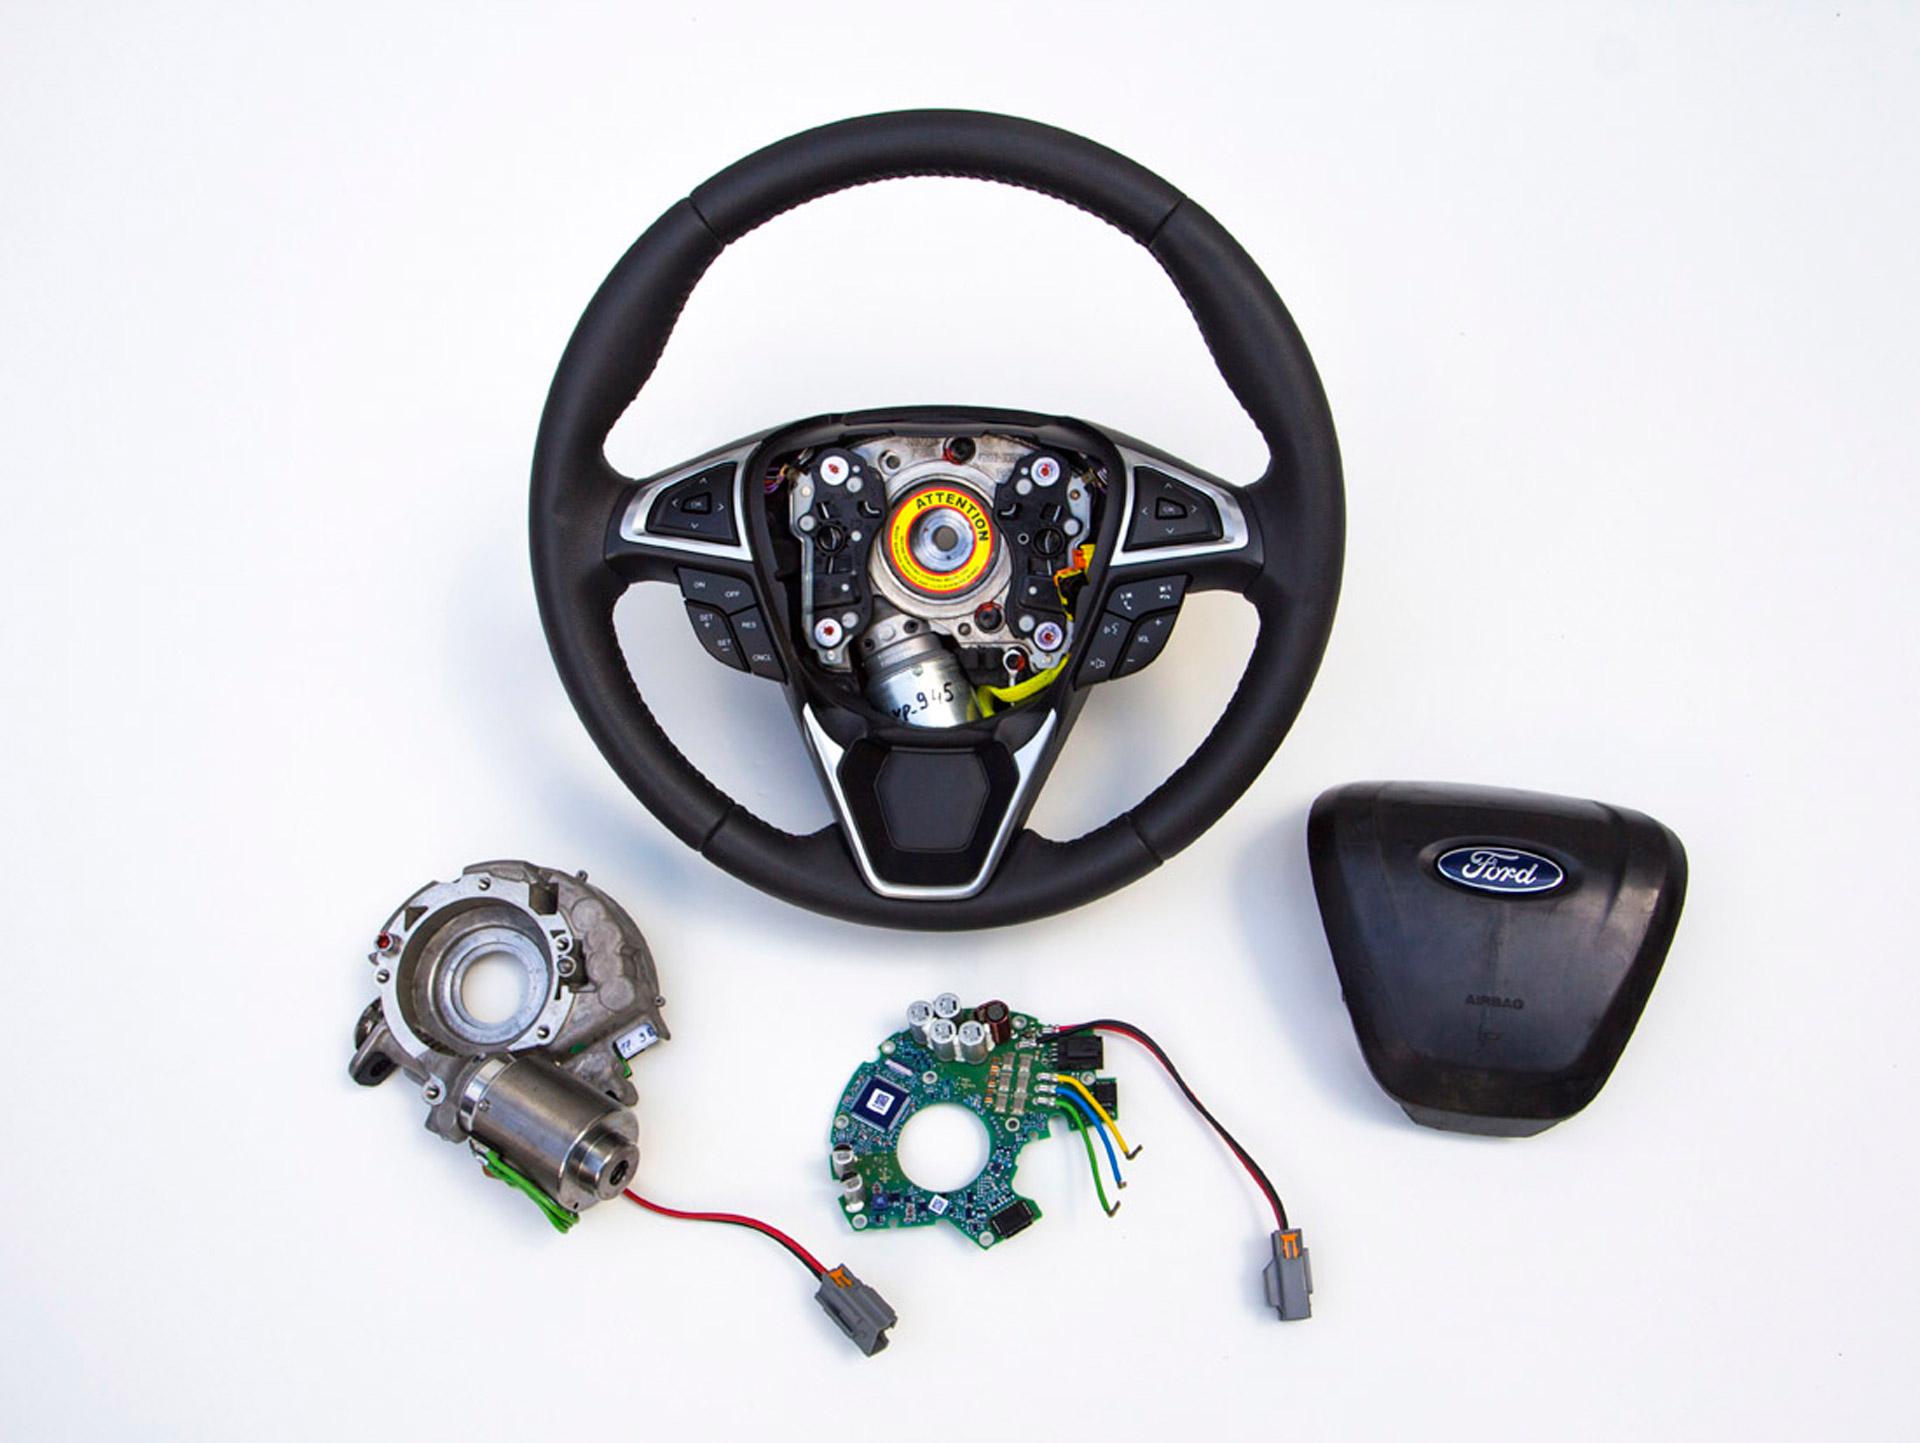 Lenksysteme autonomes Fahren